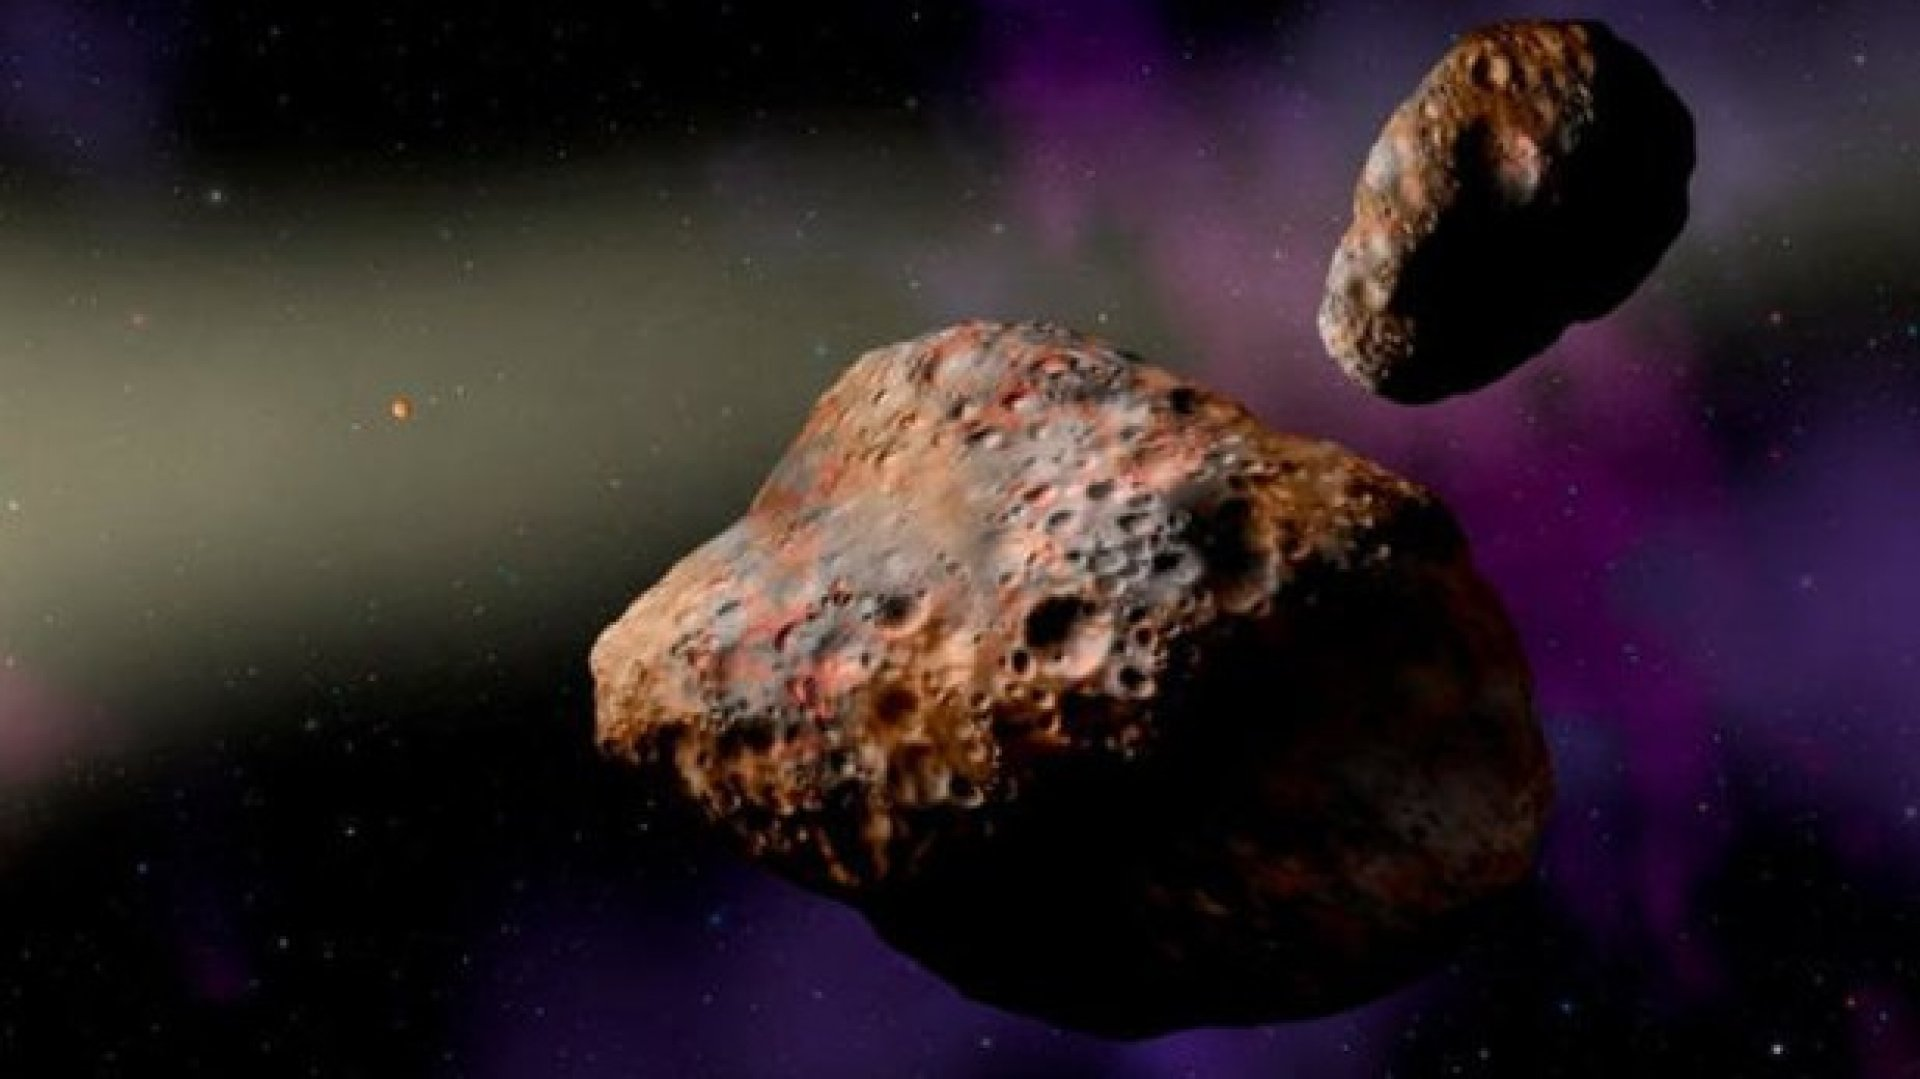 asteroid mass calculator - HD1024×768